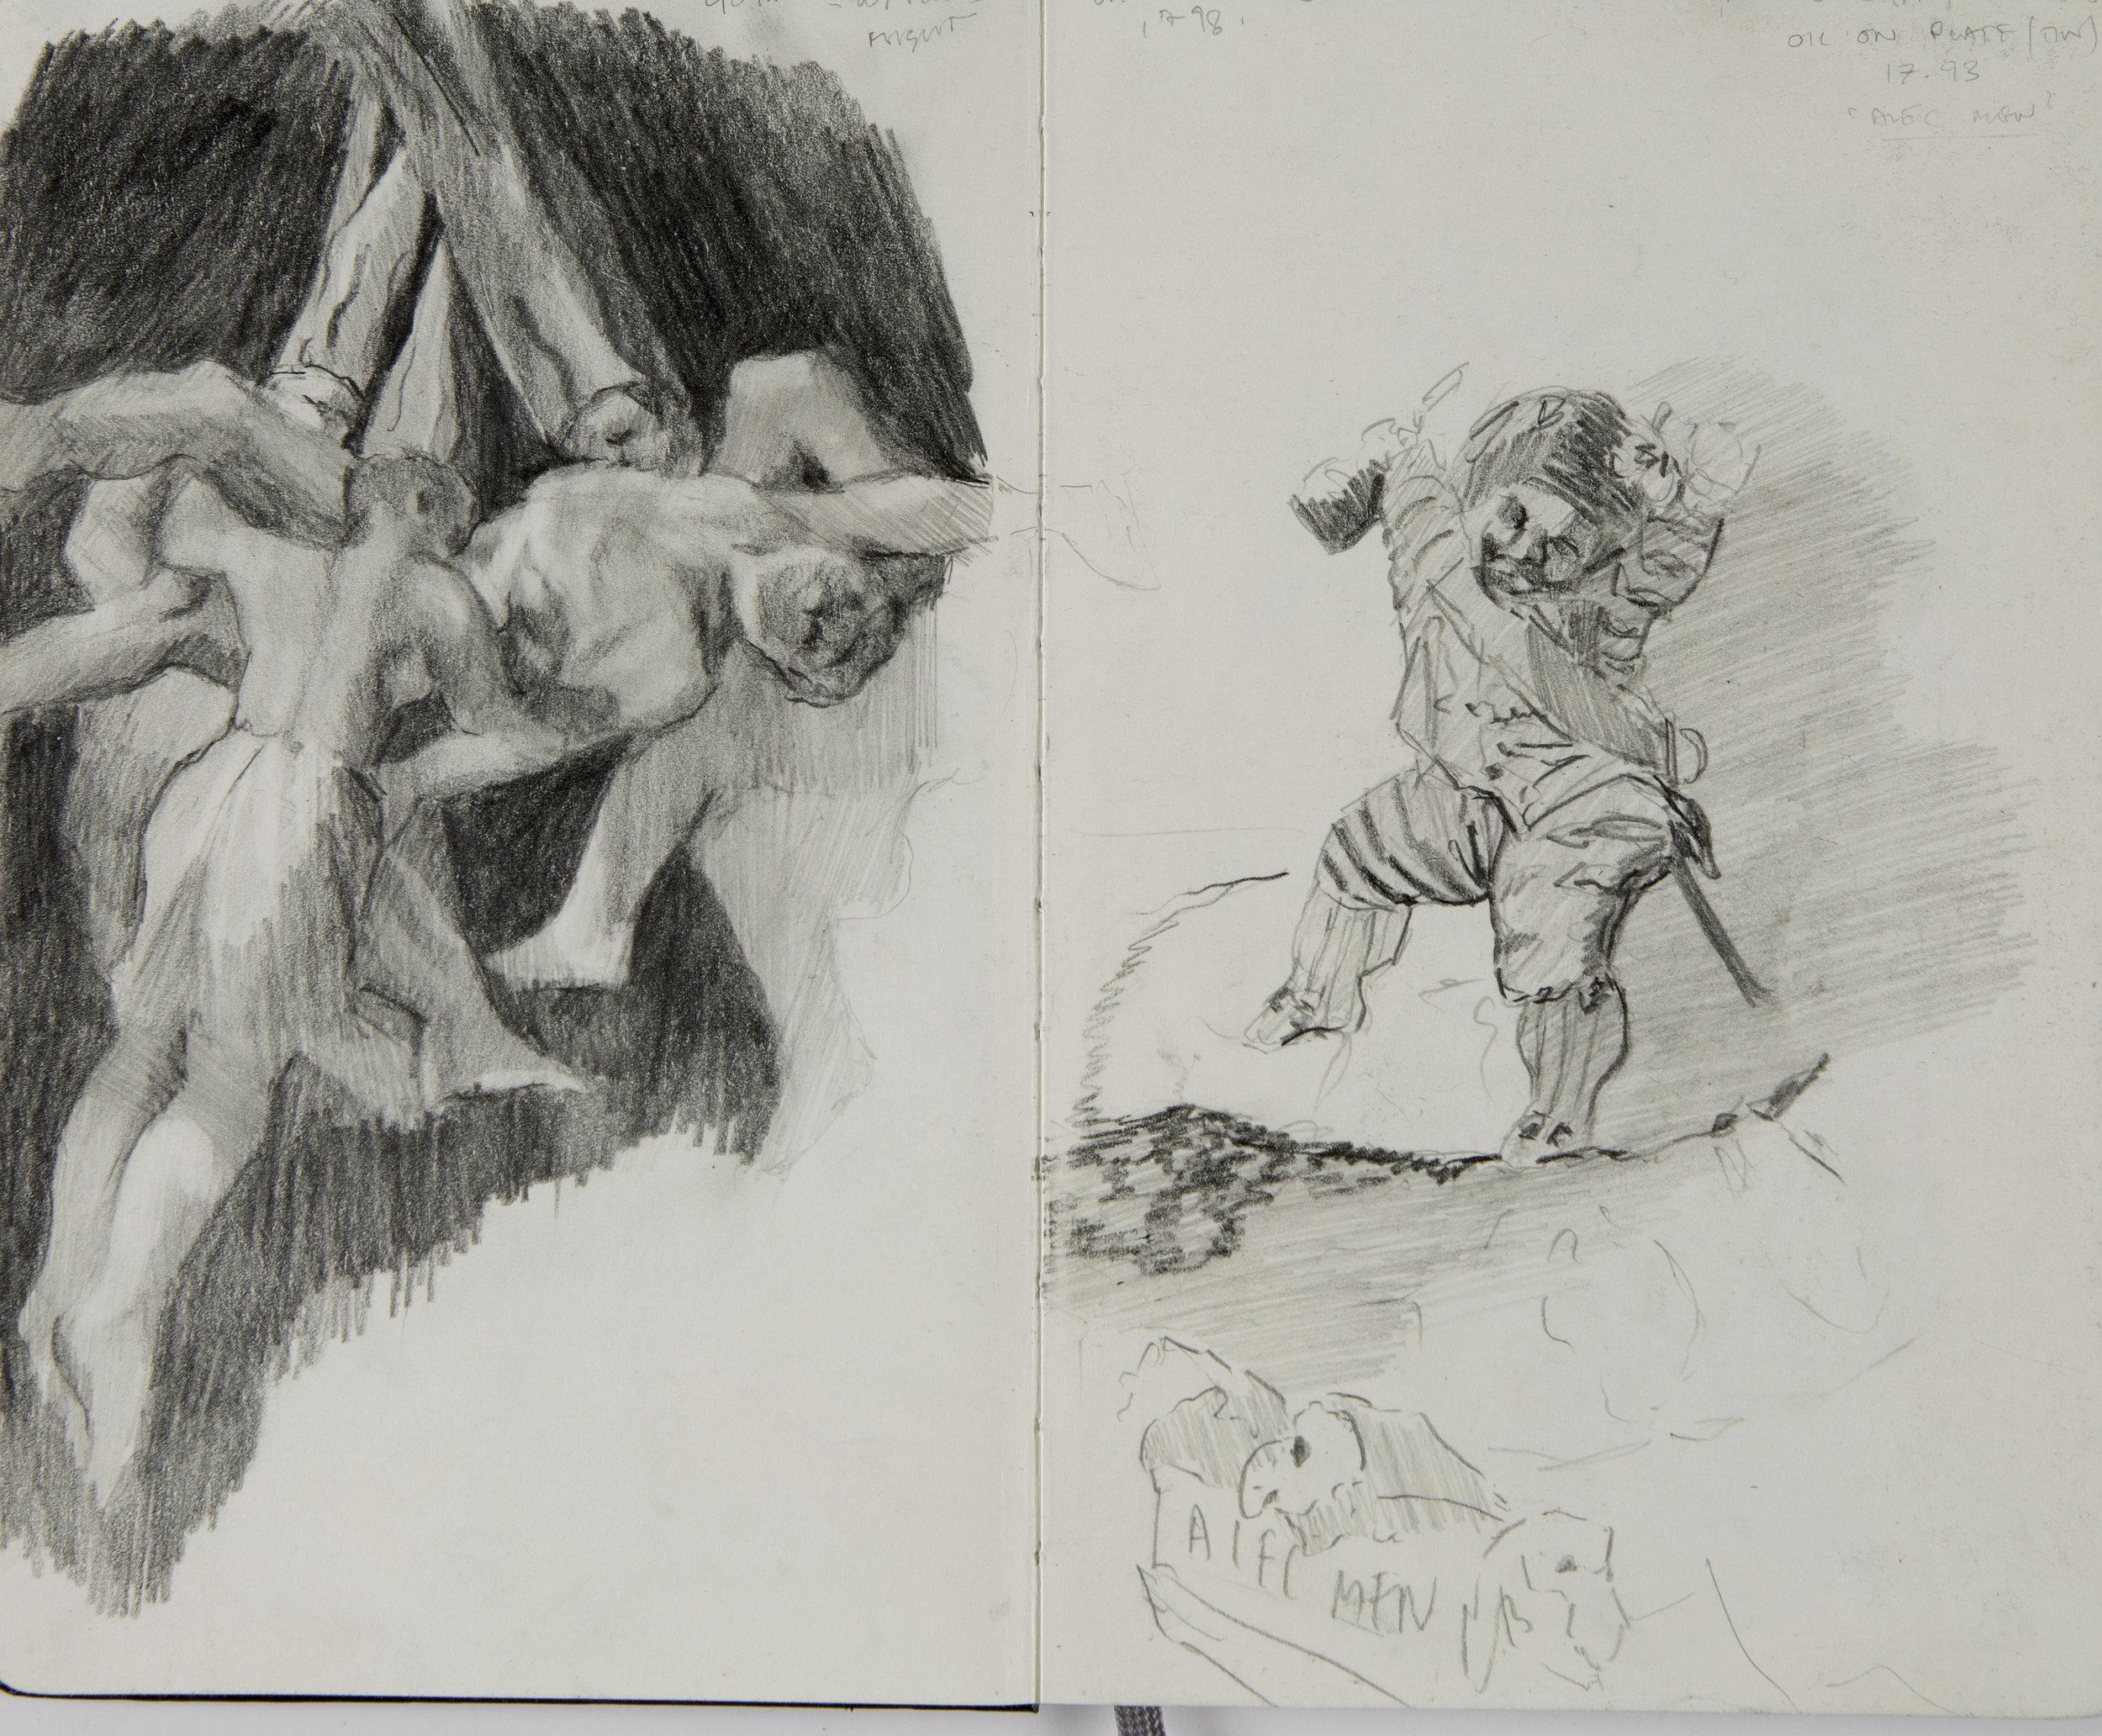 Sketchbook  studies, after 'Witches Flight,' 1798, 'Strolling Players Art Musique,' Francisco de Goya